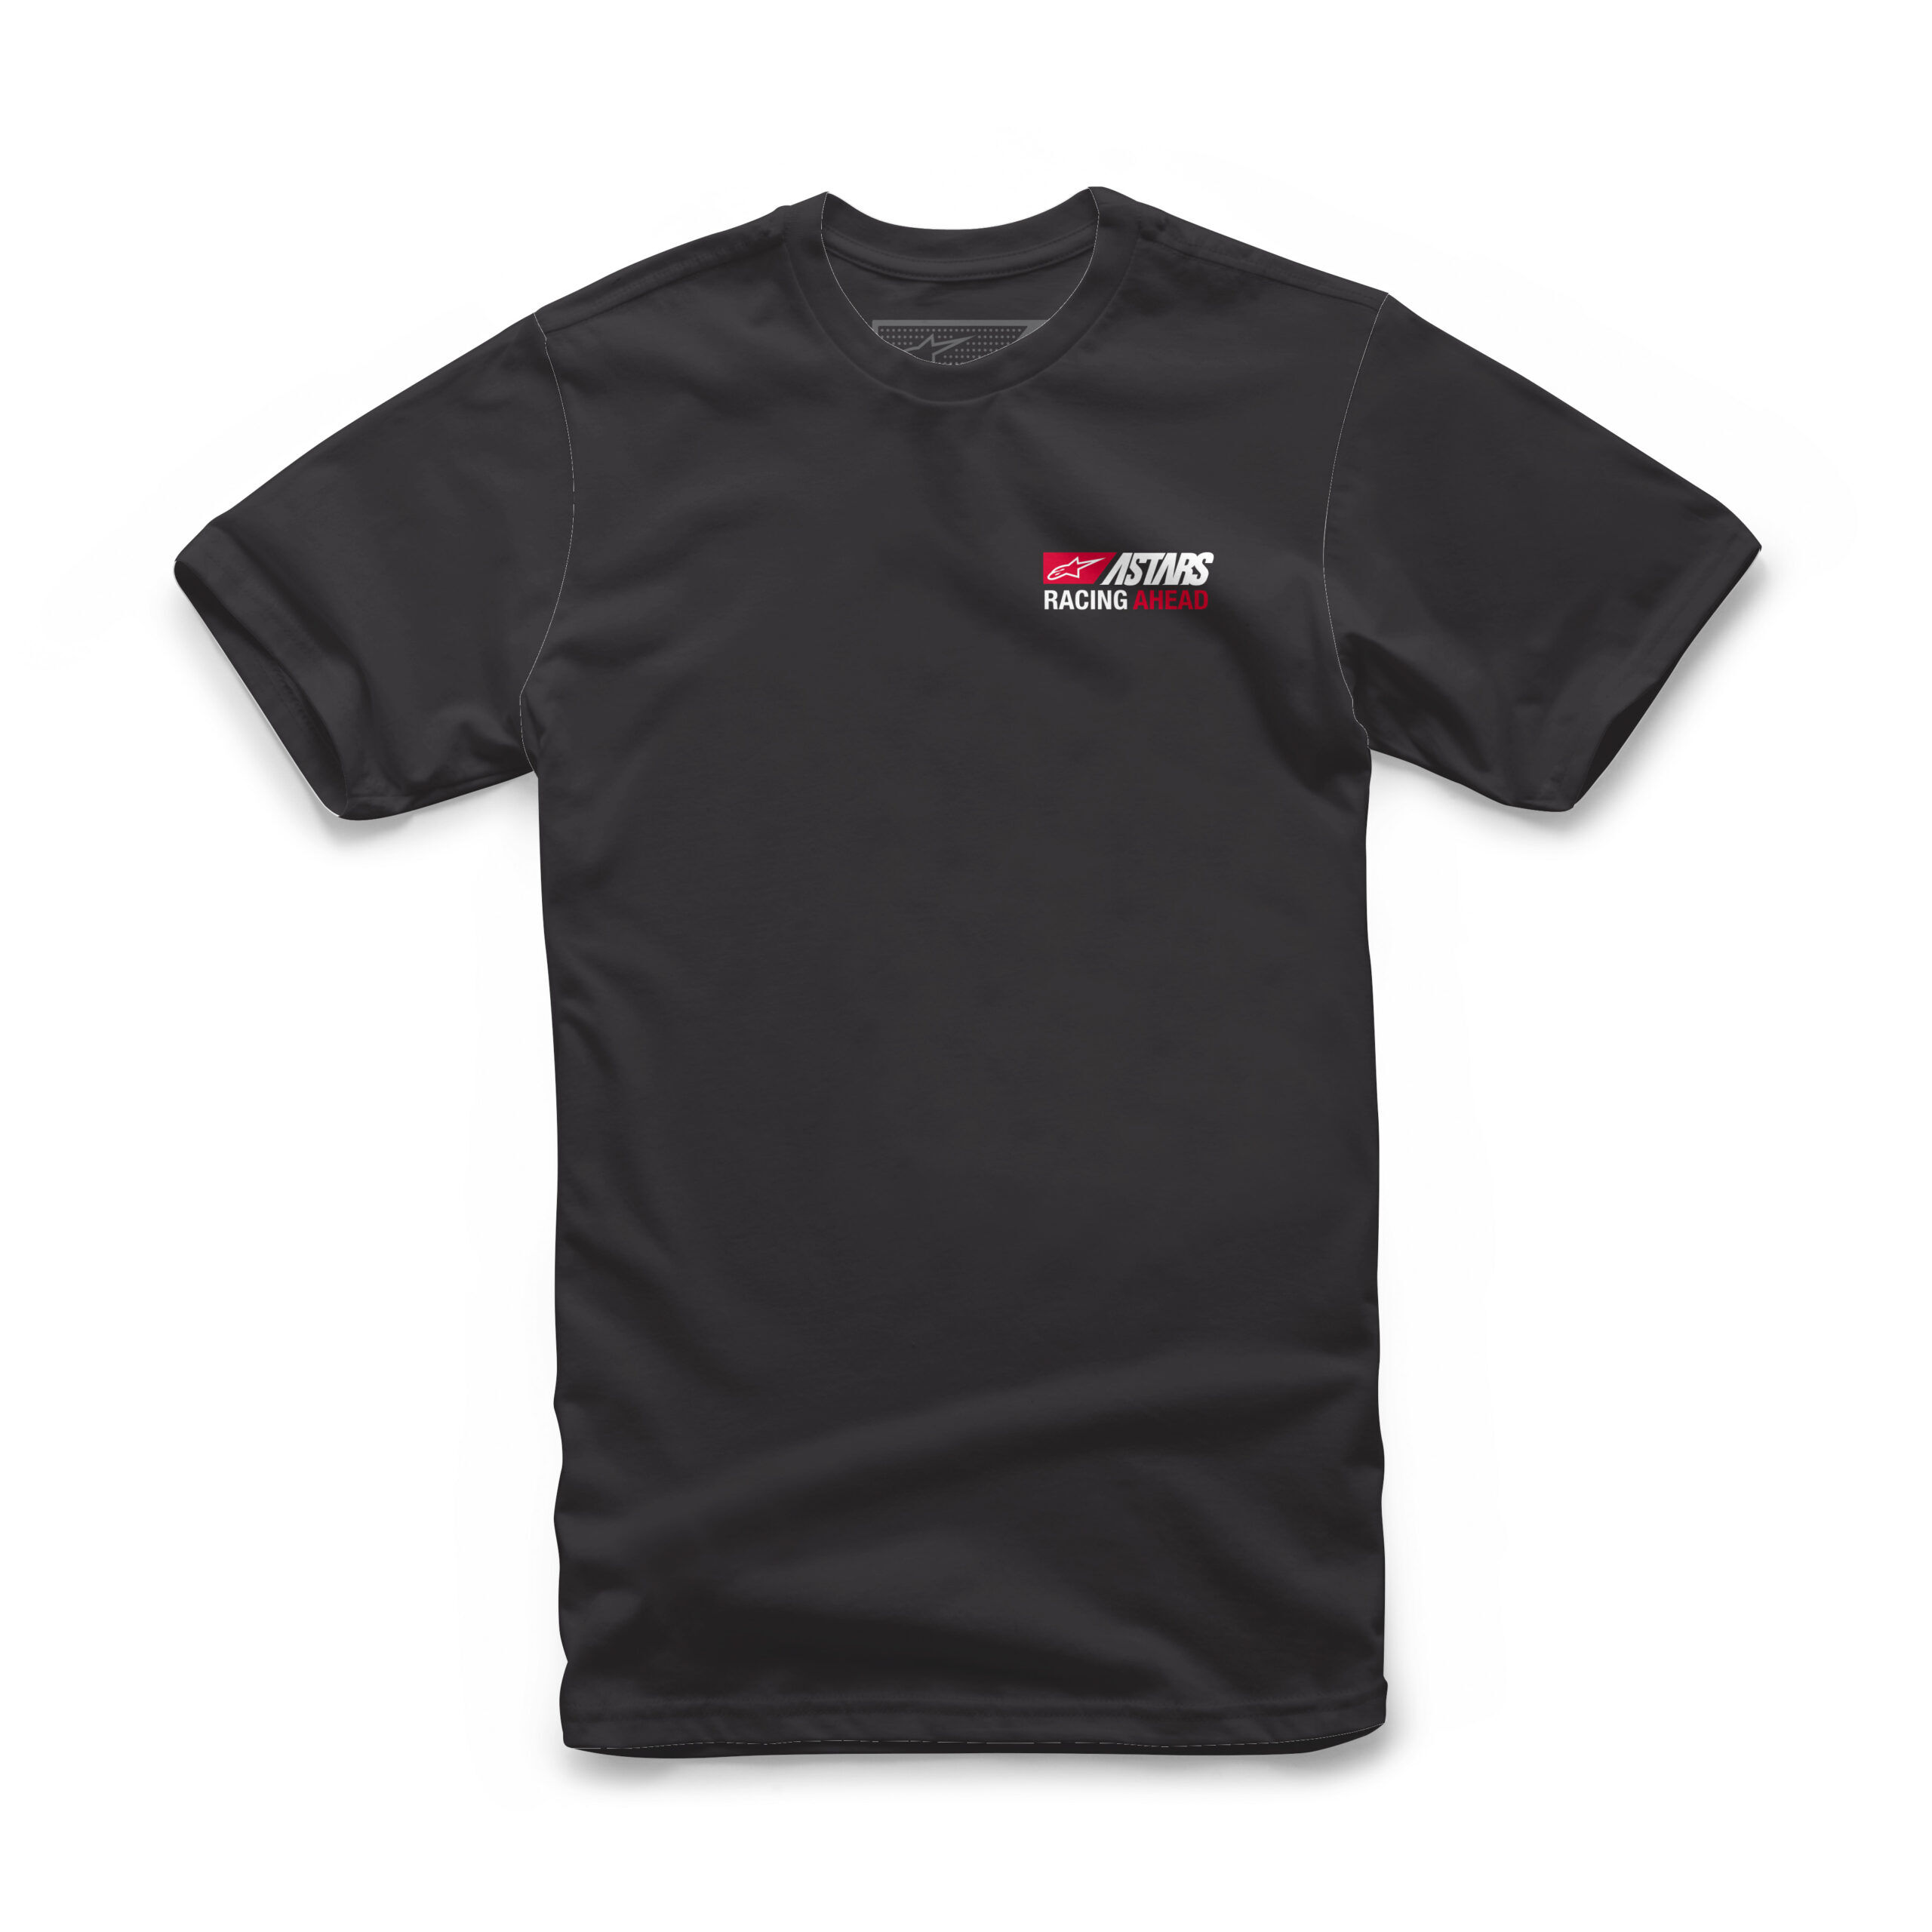 Alpinestars RACING AHEAD Established 1963 Tee - zwarte mannen T-shirt